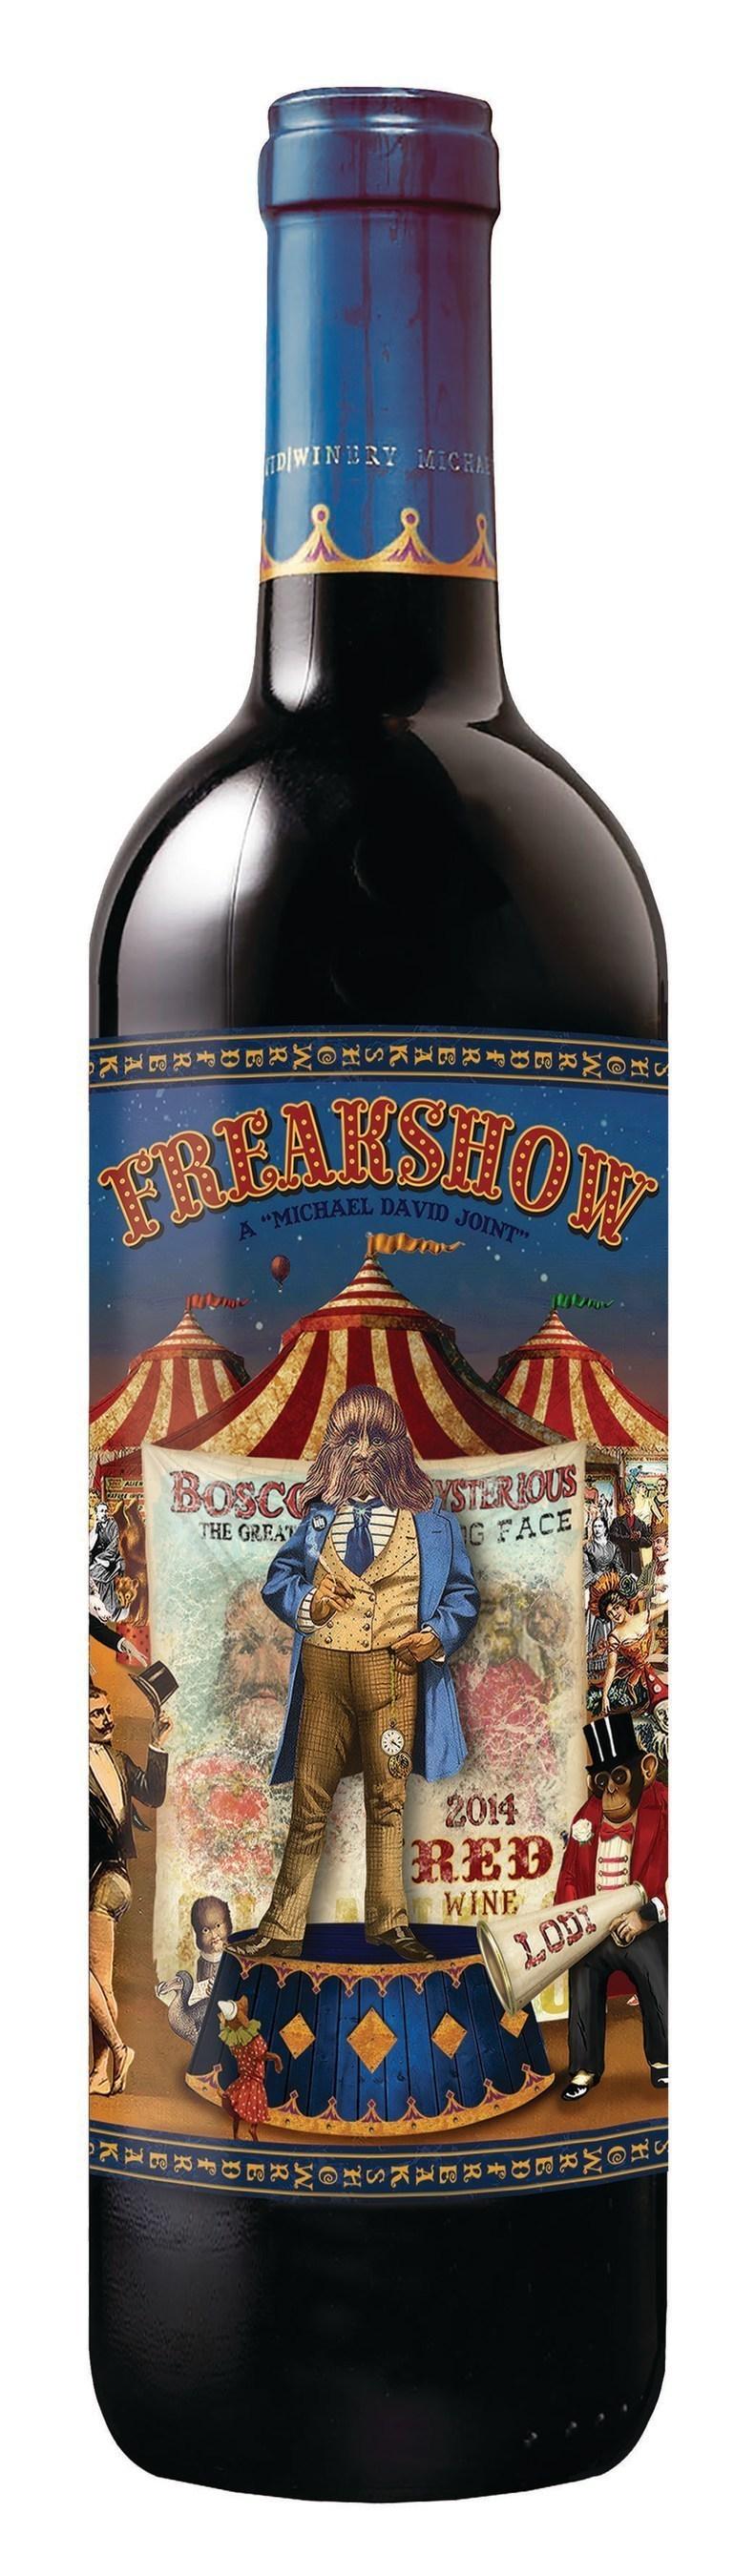 2014 Freakshow Red Wine